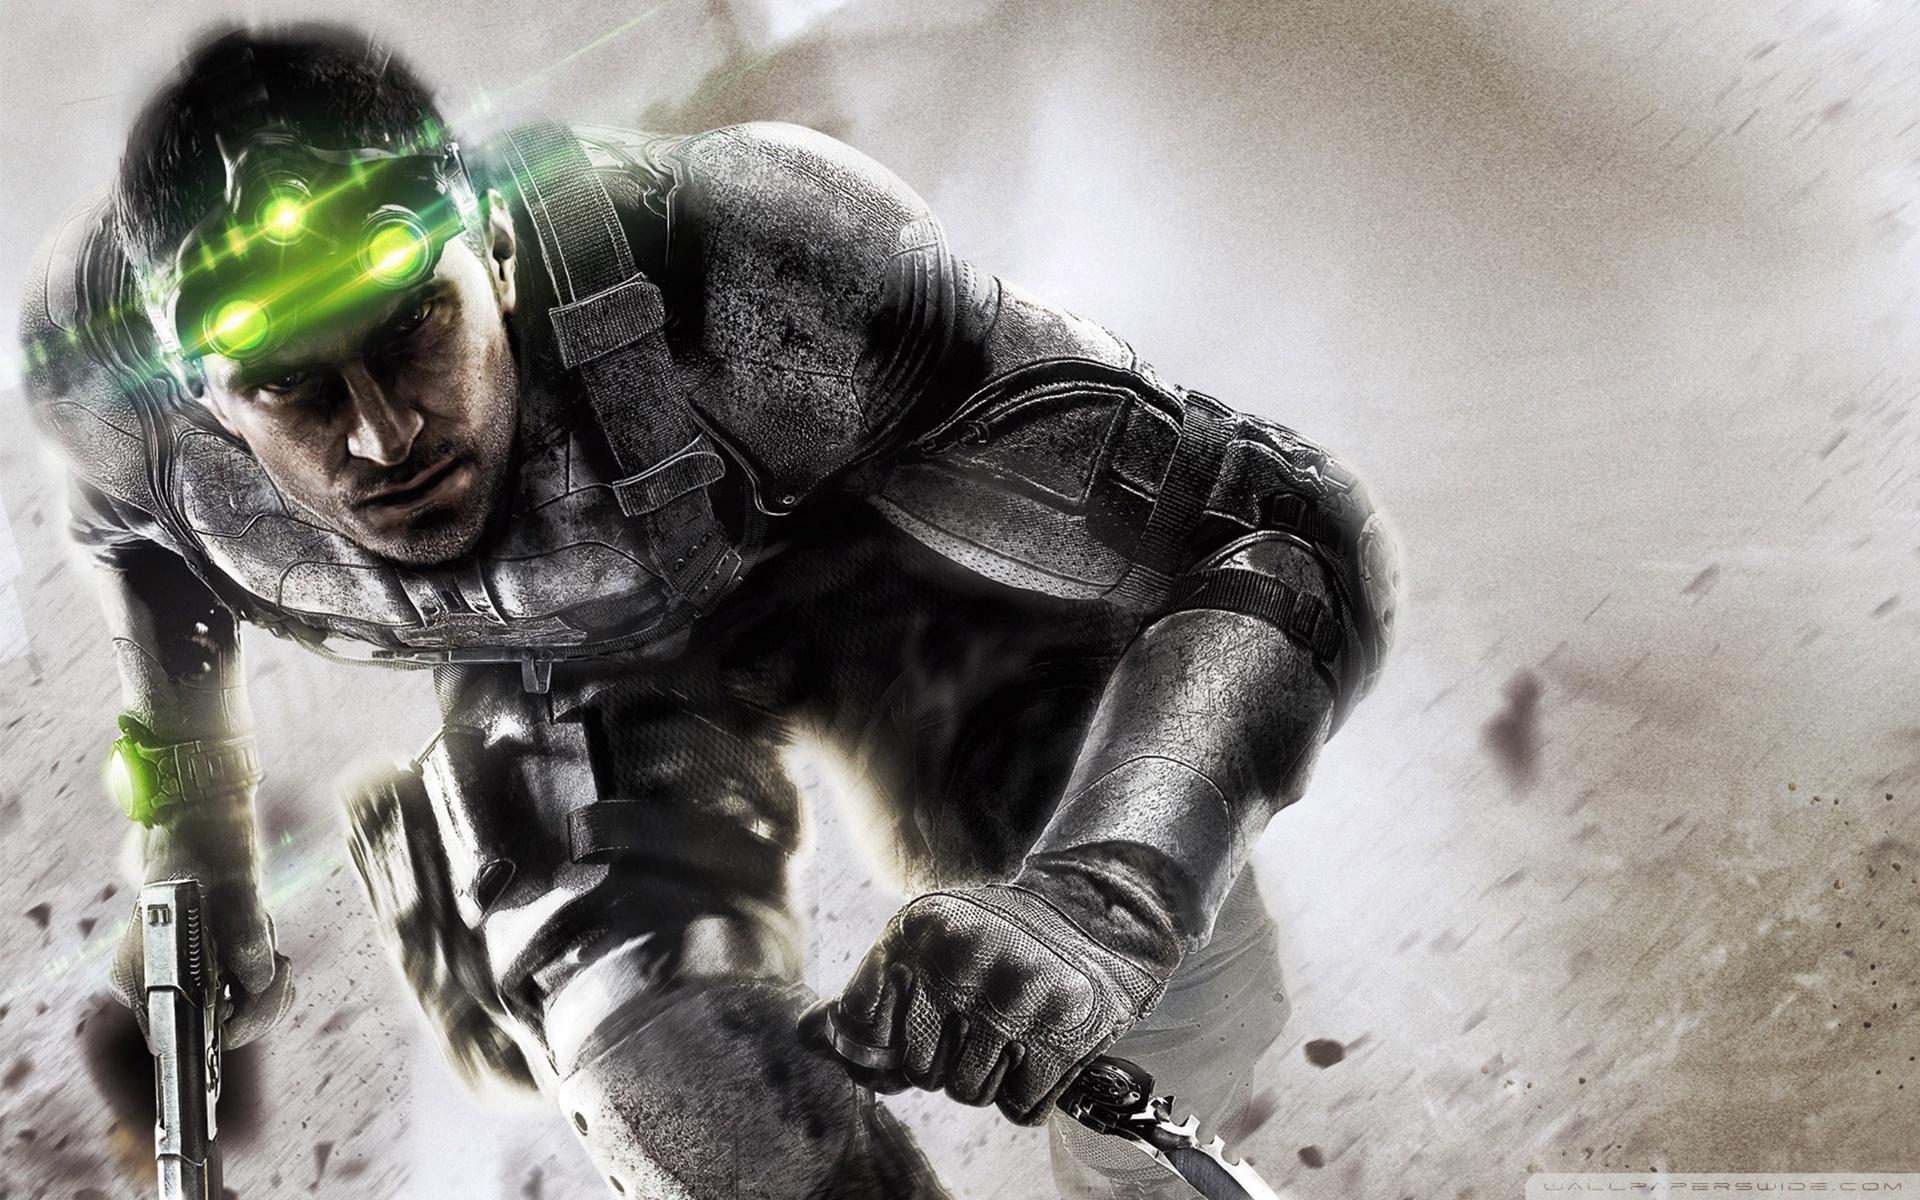 Splinter Cell Black List HD Wide Wallpaper for Widescreen